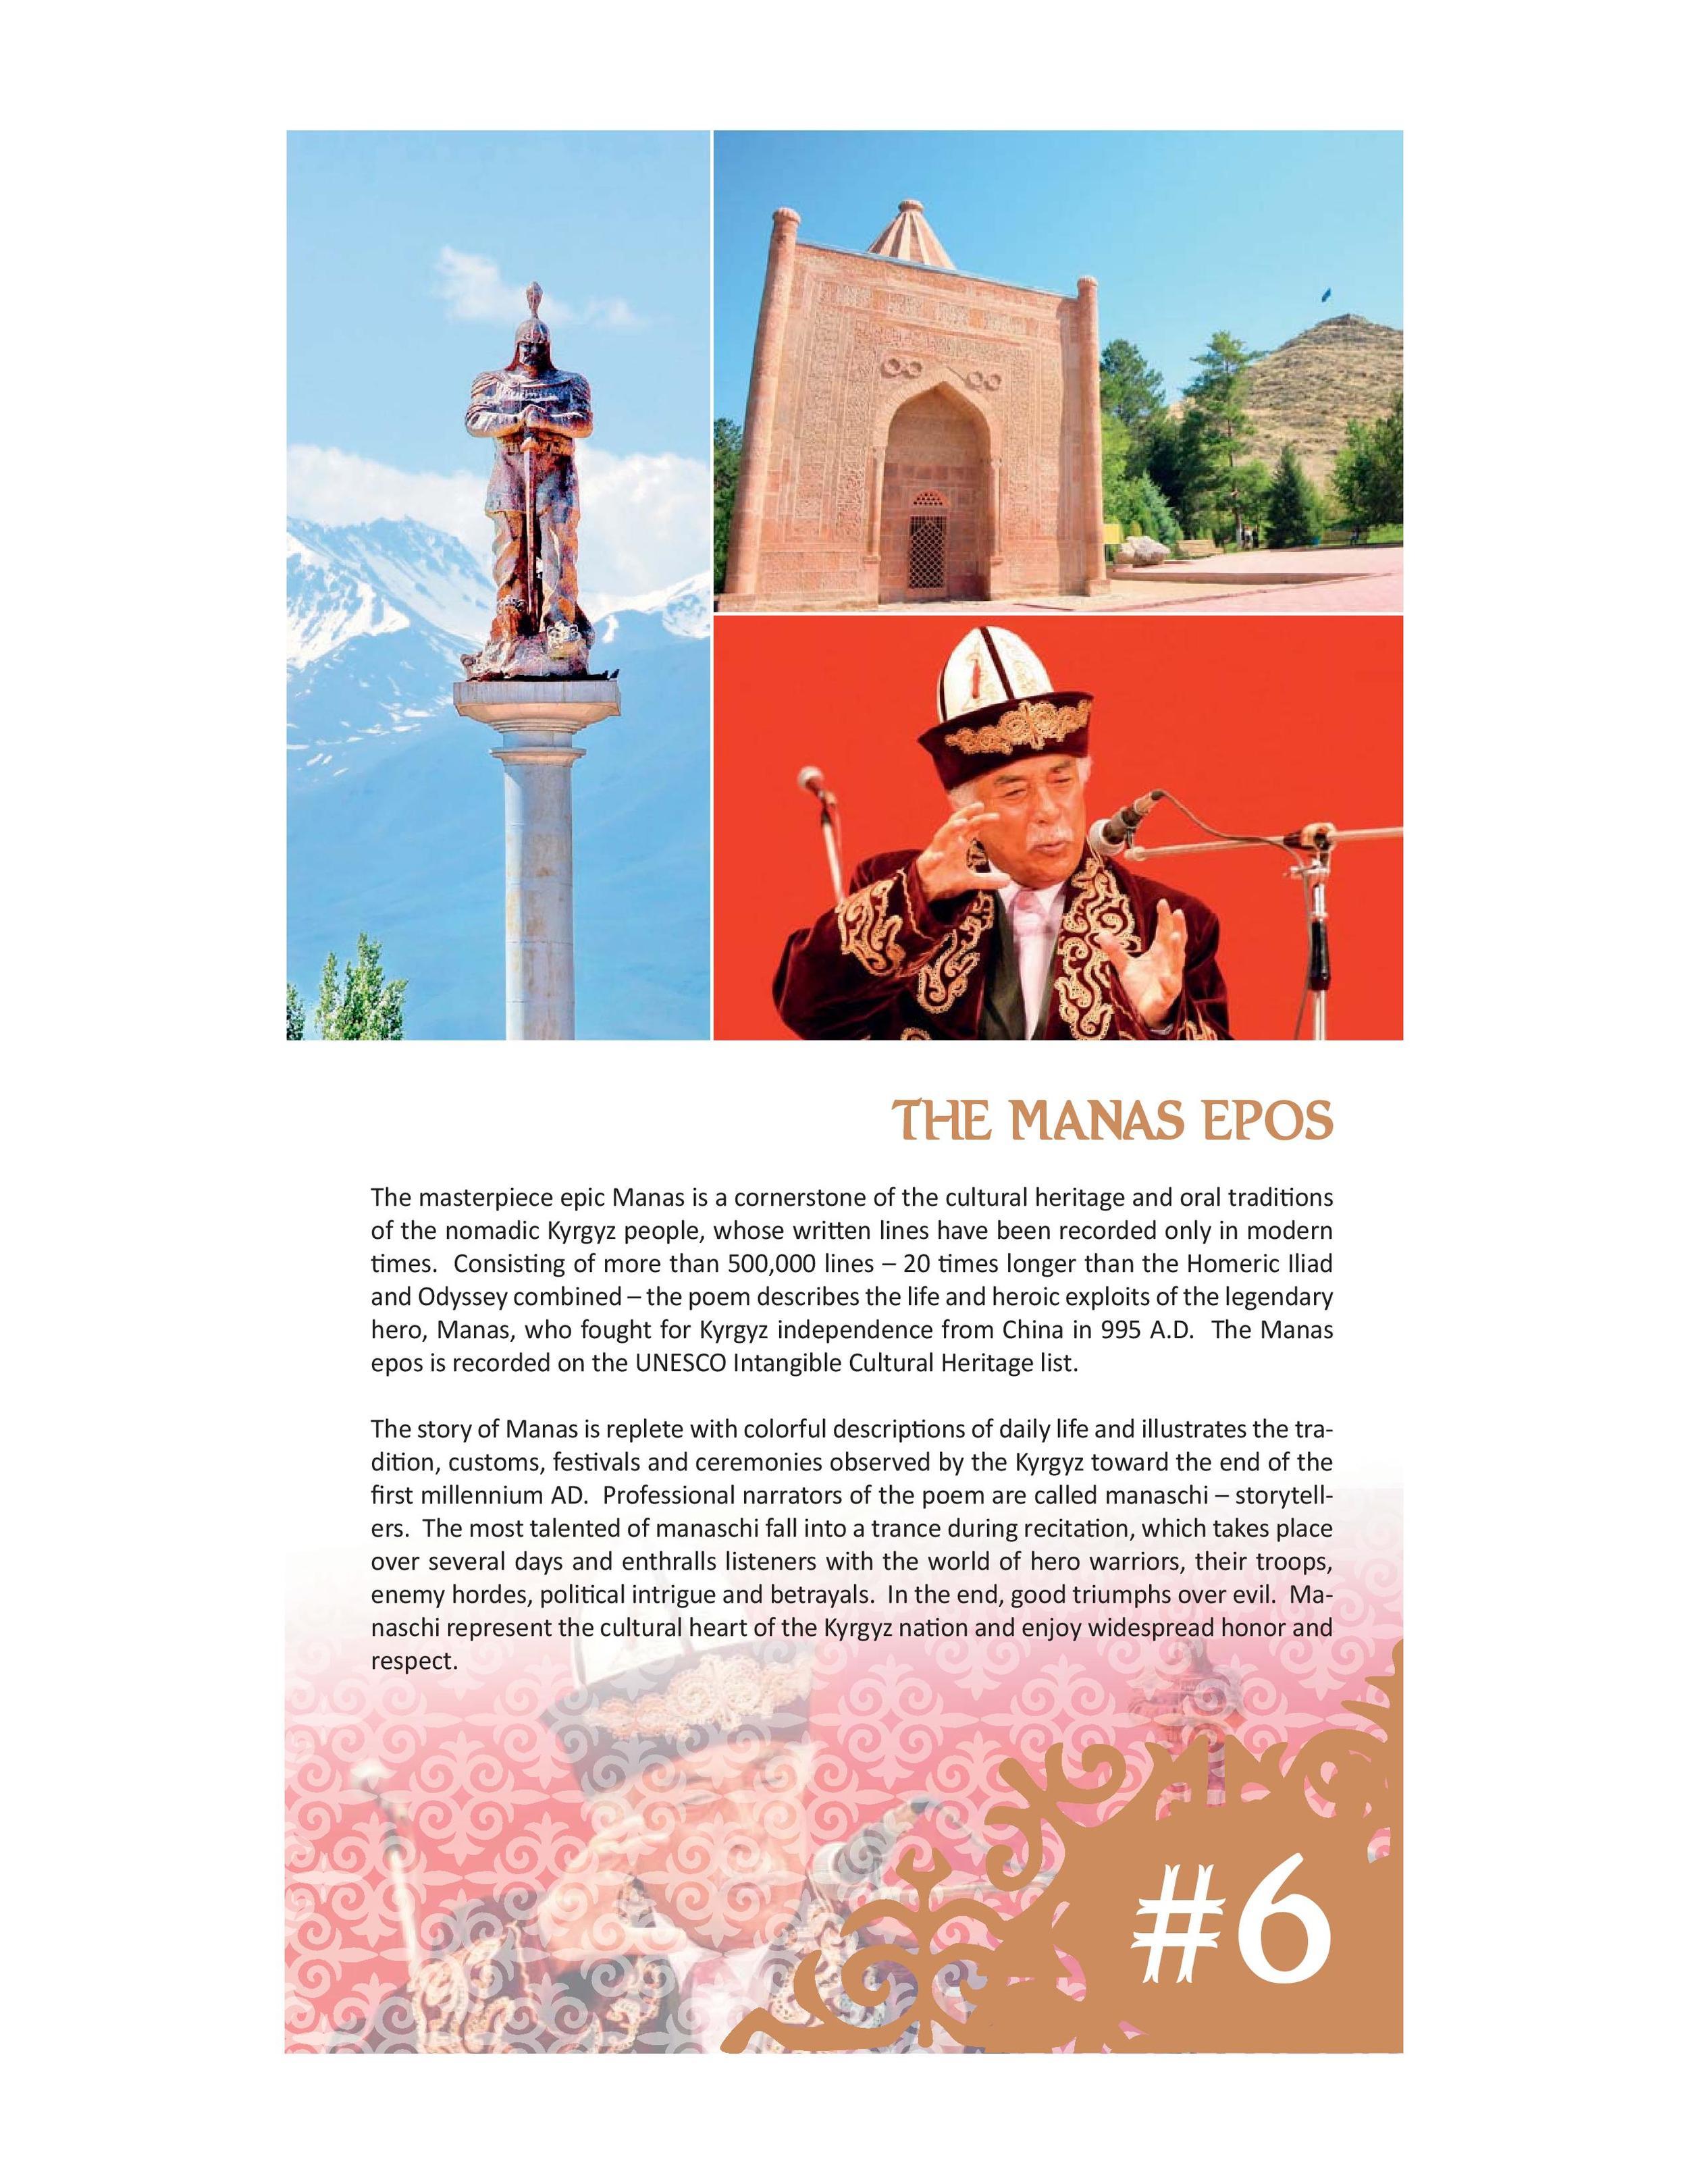 10 reasons to explore Kyrgyzstan_SMALL-page-007.jpg